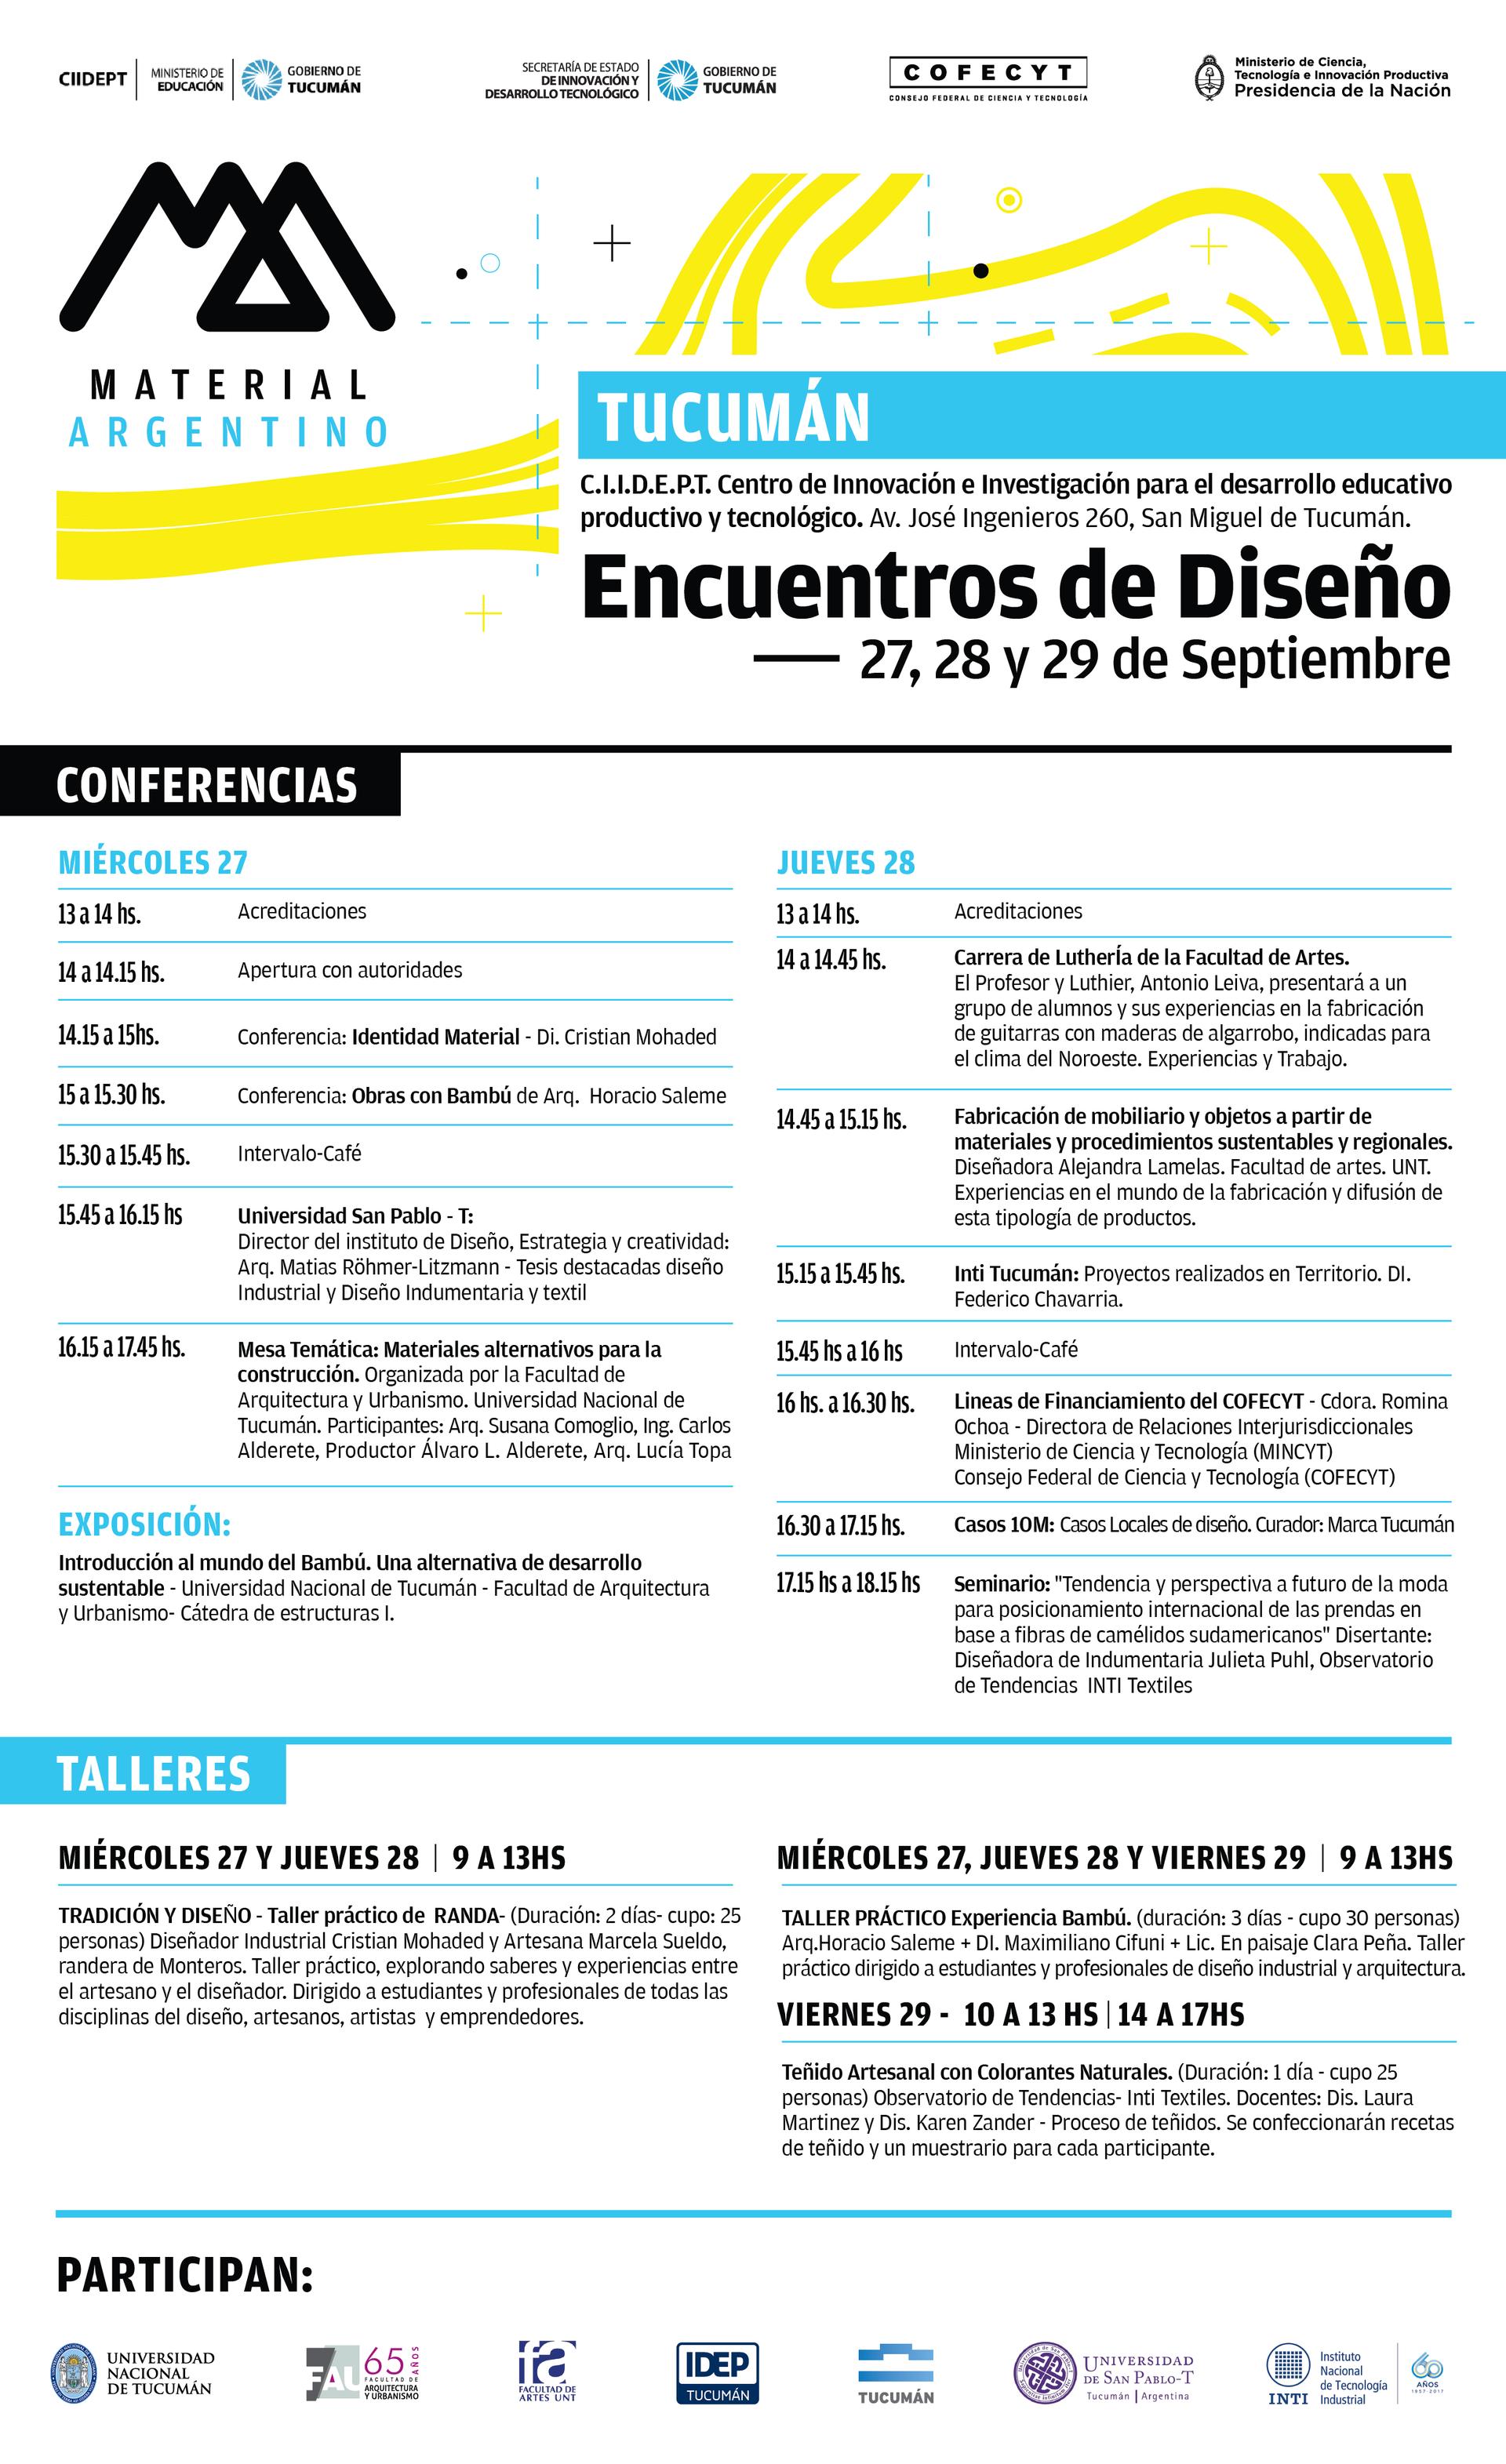 Agenda_Tucumán-02.png